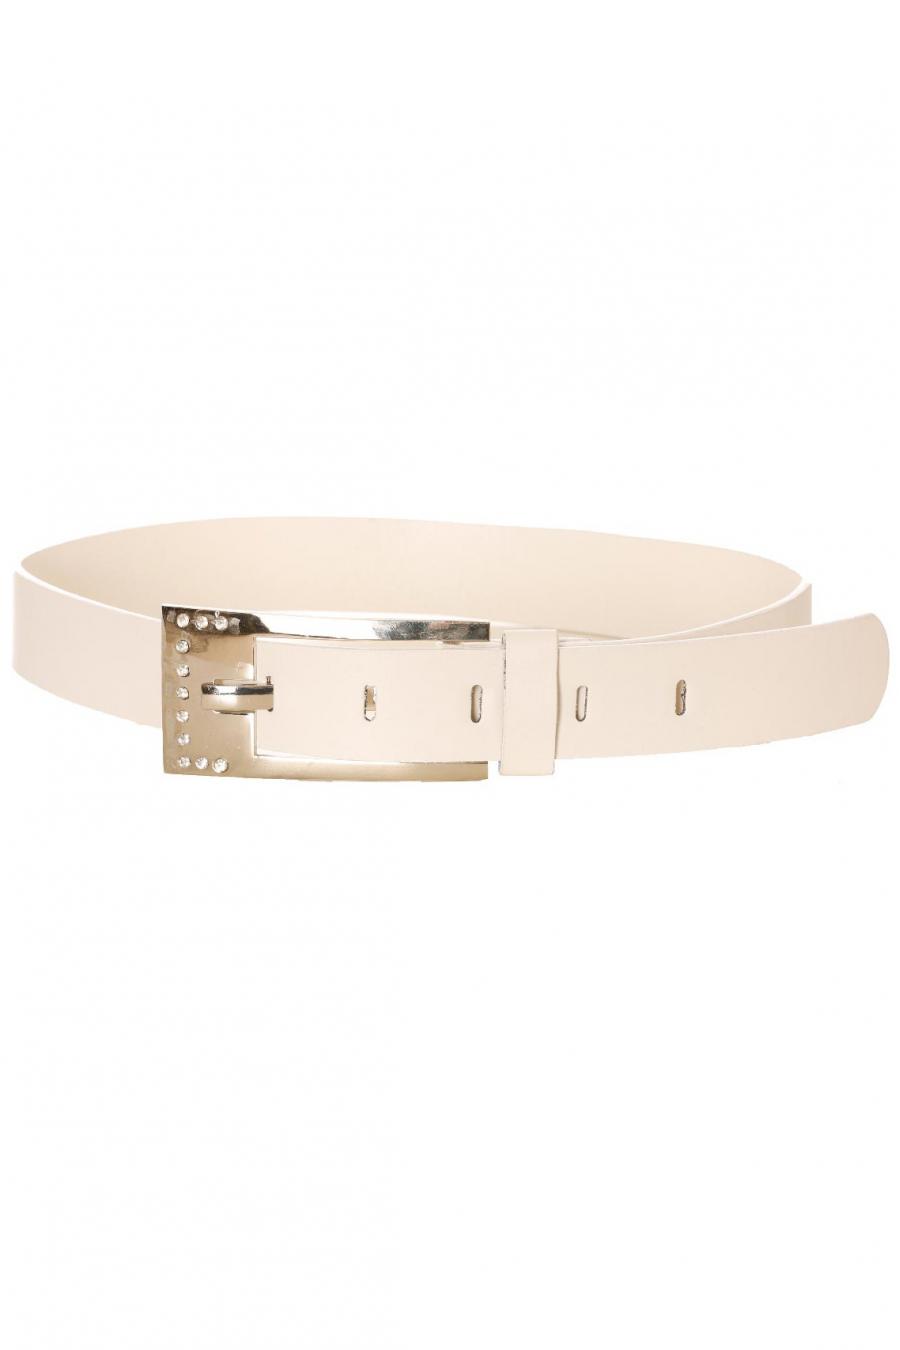 White belt, rectangle rhinestone buckle. BG-0237